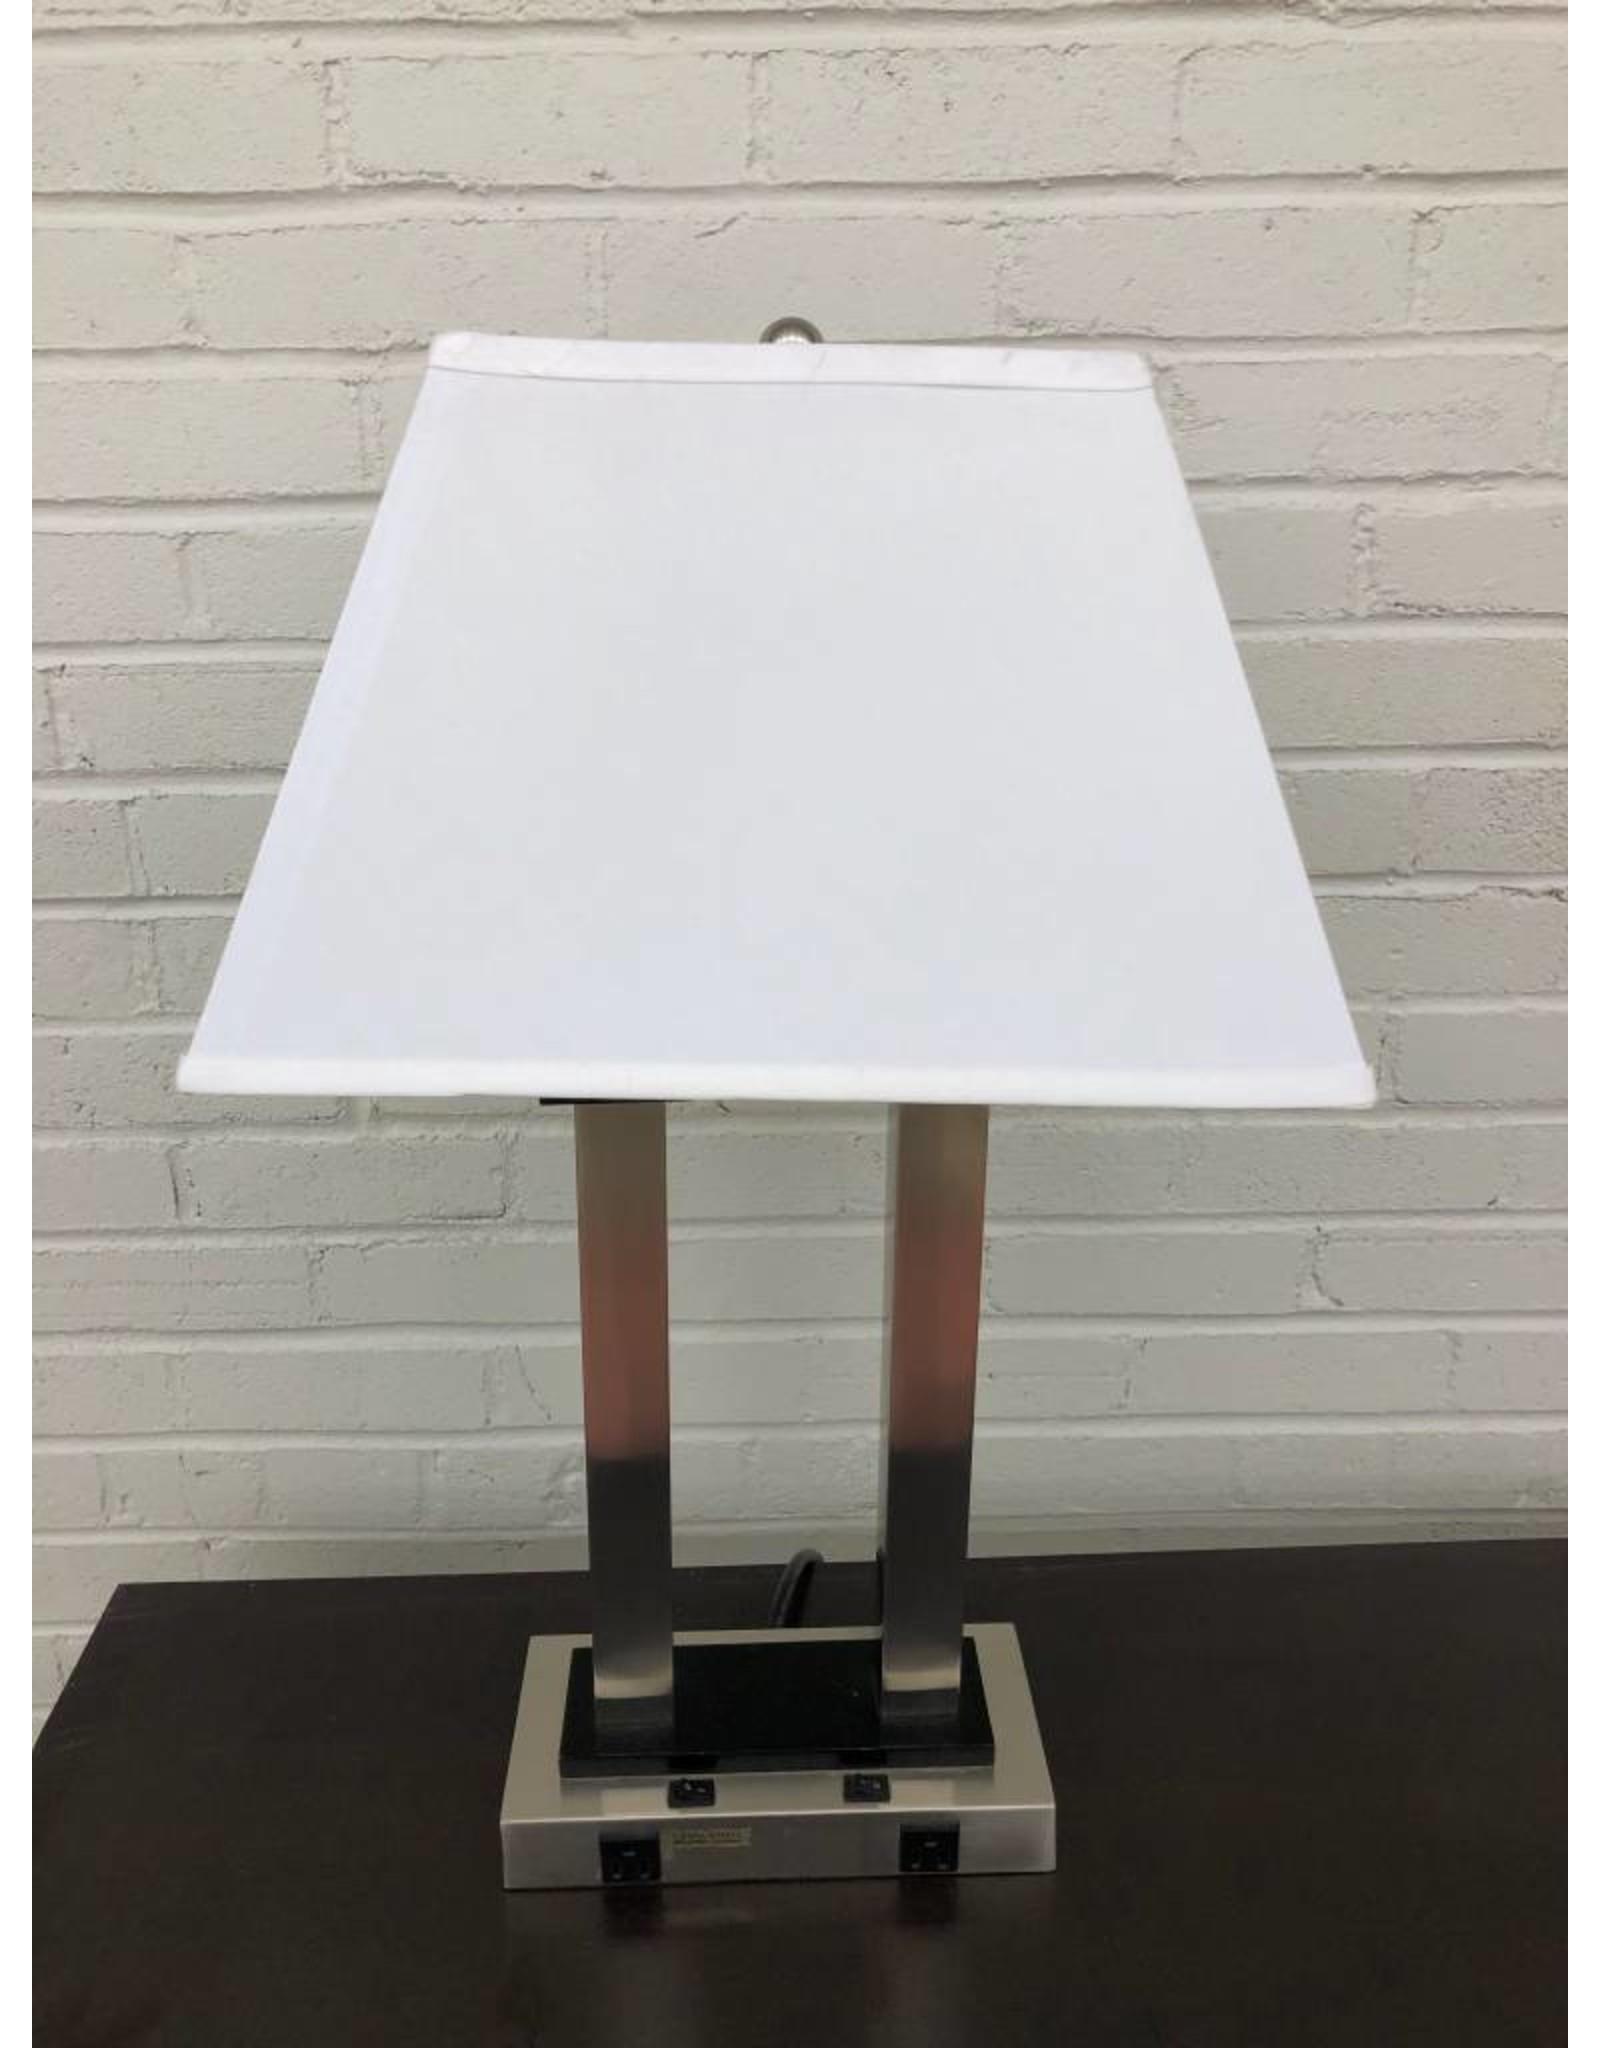 BK double pole table lamp